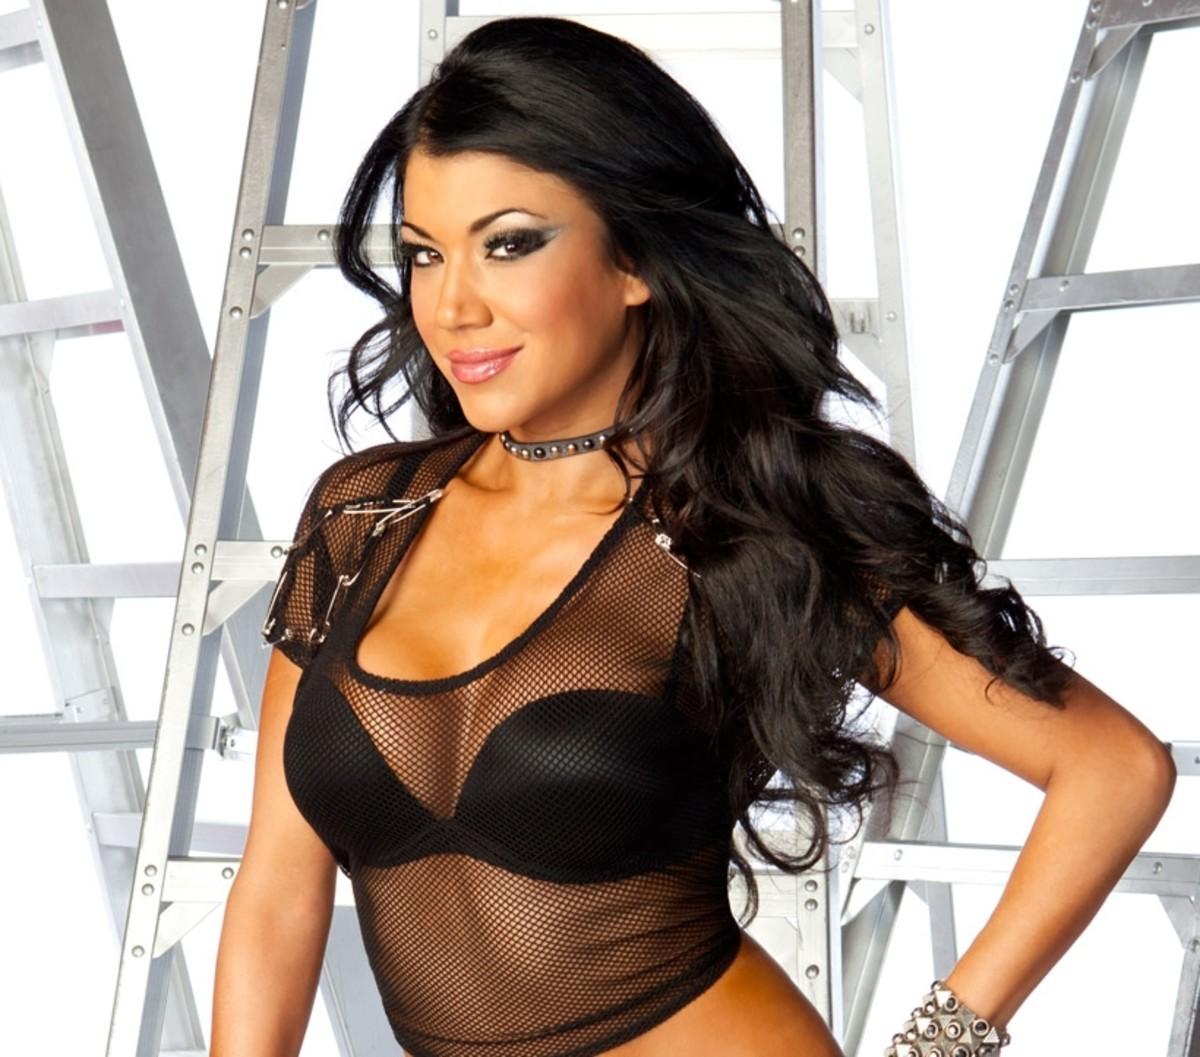 Rosa Mendes (WWE Diva)